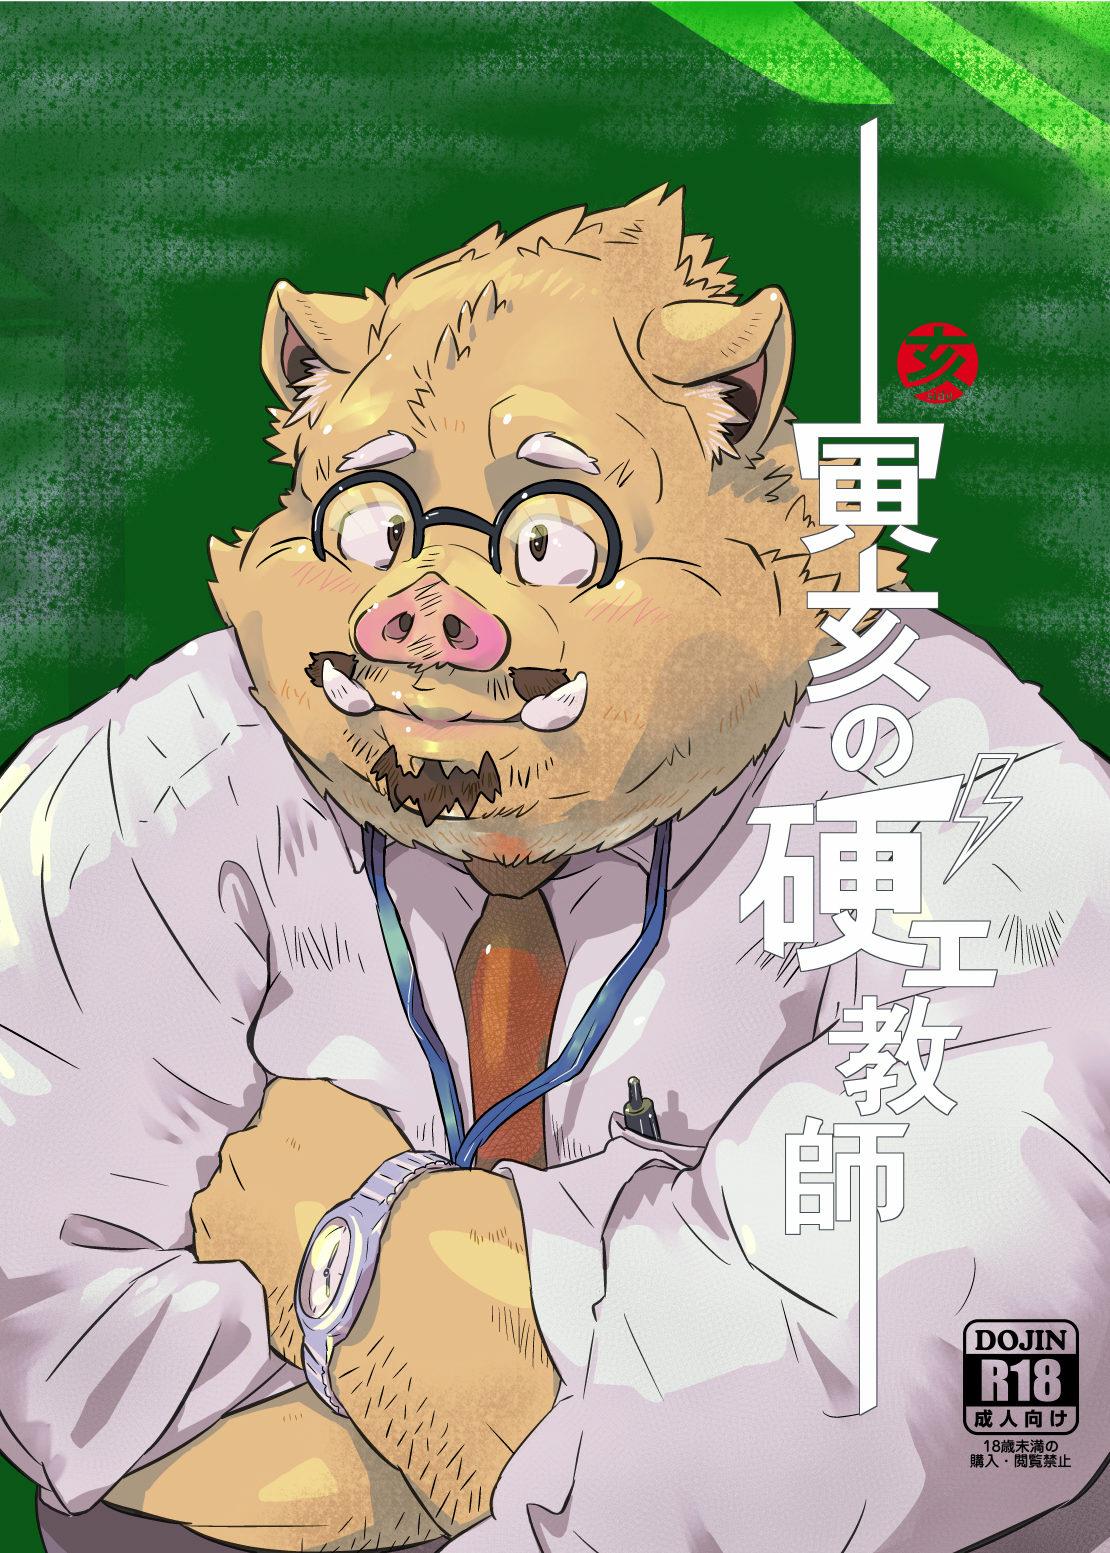 [TACHIWALKER] の【寅亥の硬ェ教師 -亥side-】